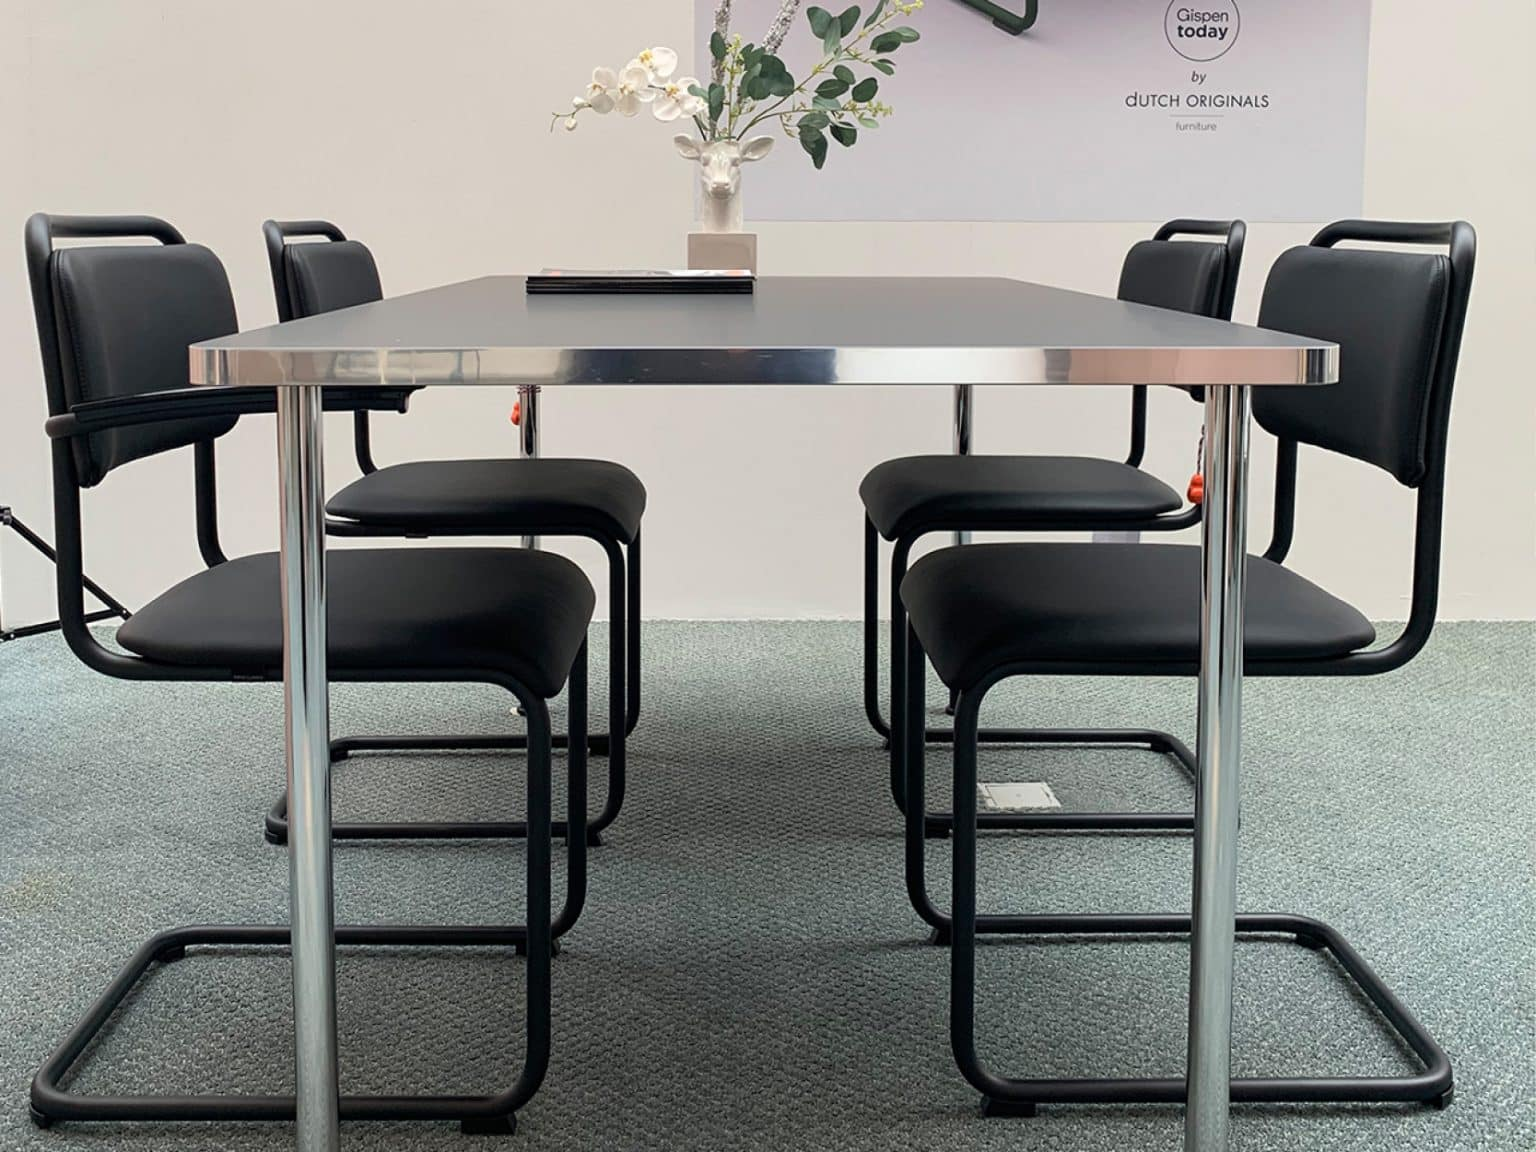 Dutcho Originals fauteuil Gispen 201XL sf